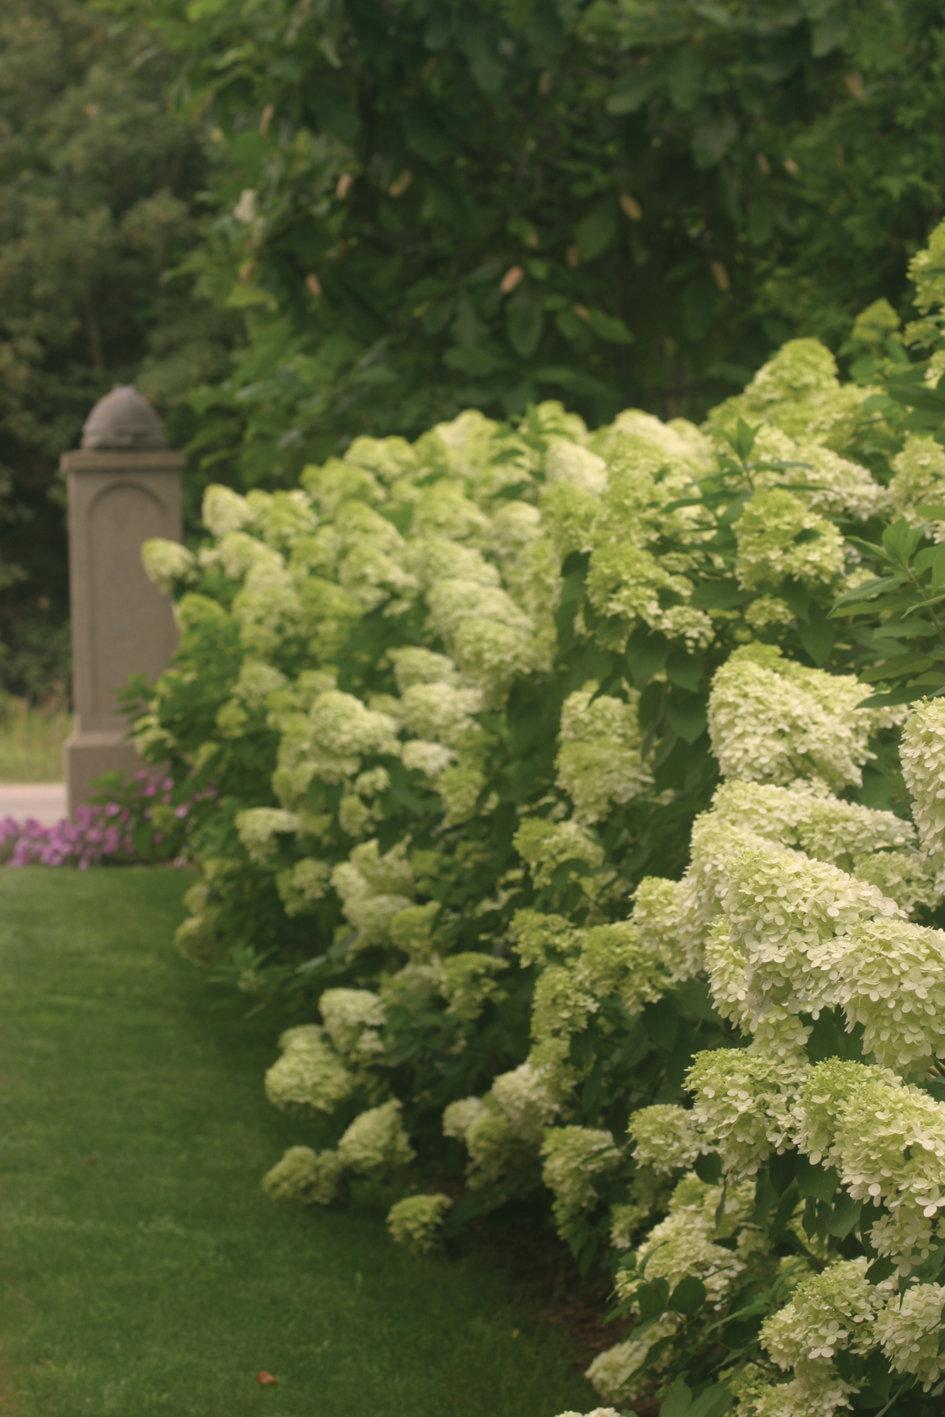 39 limelight 39 panicle hydrangea hydrangea paniculata proven winners. Black Bedroom Furniture Sets. Home Design Ideas